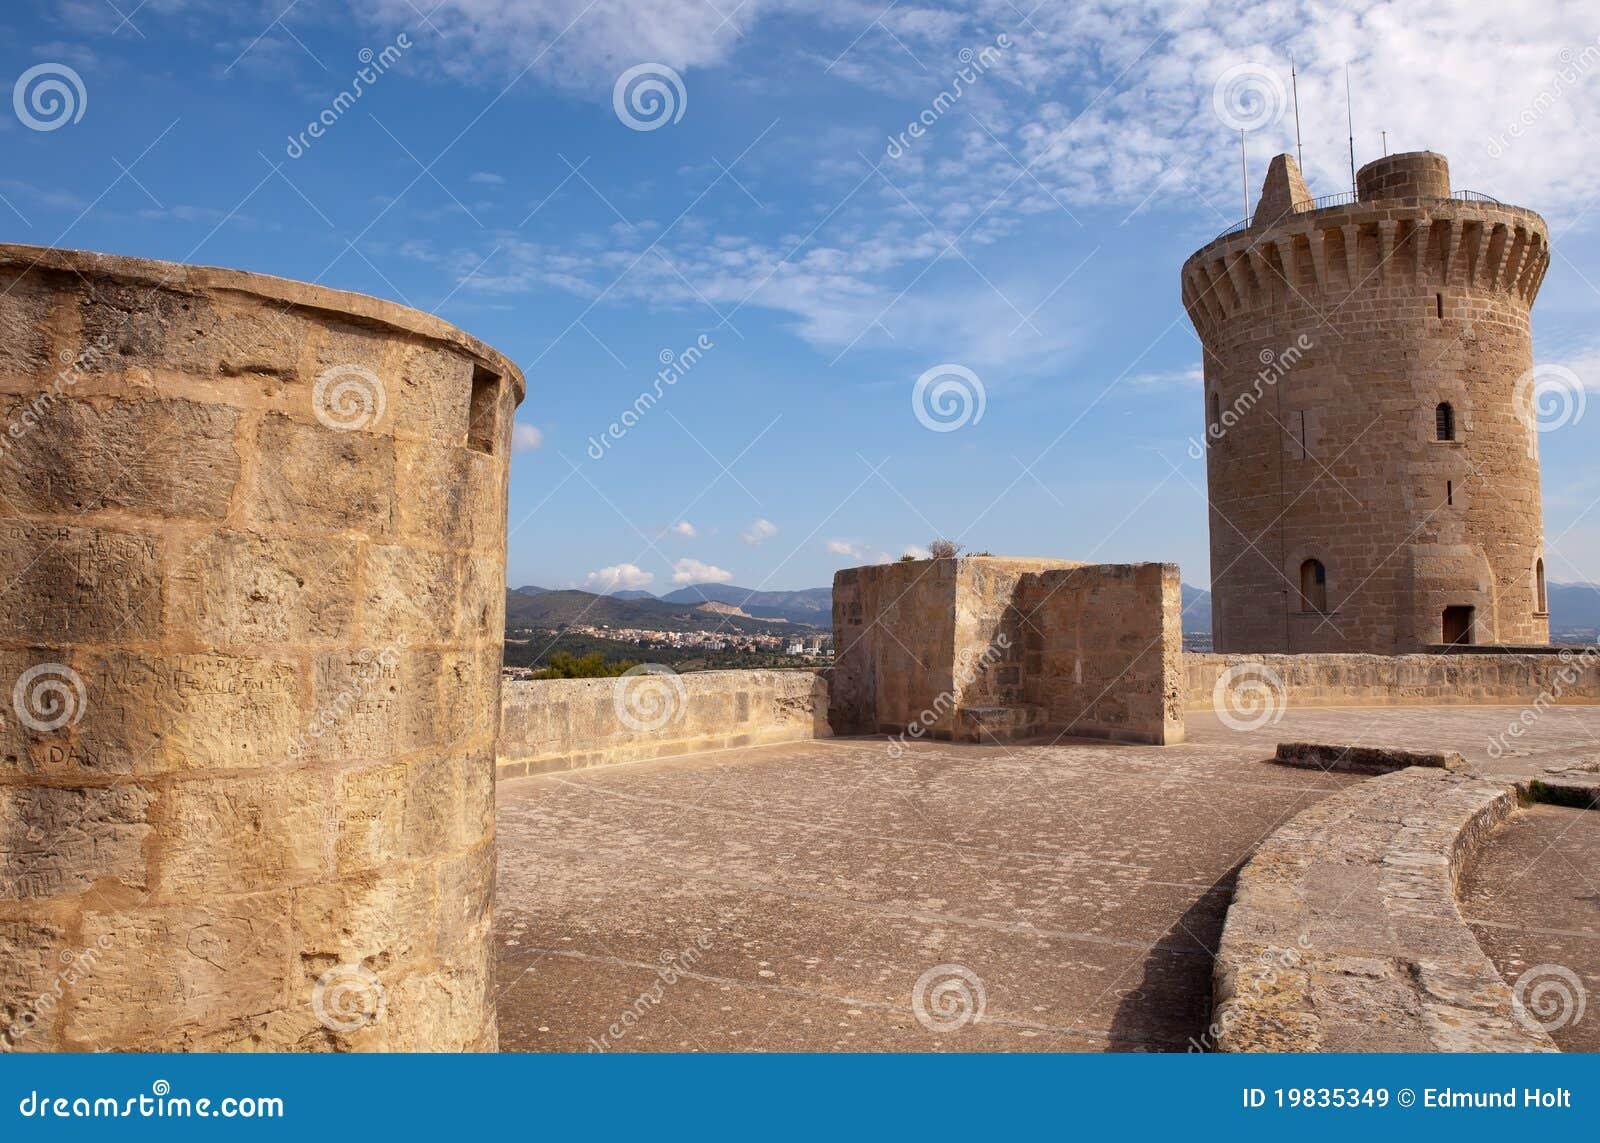 Download Bellver Castle Battlements, Palma, Majorca Stock Image - Image of history, castle: 19835349